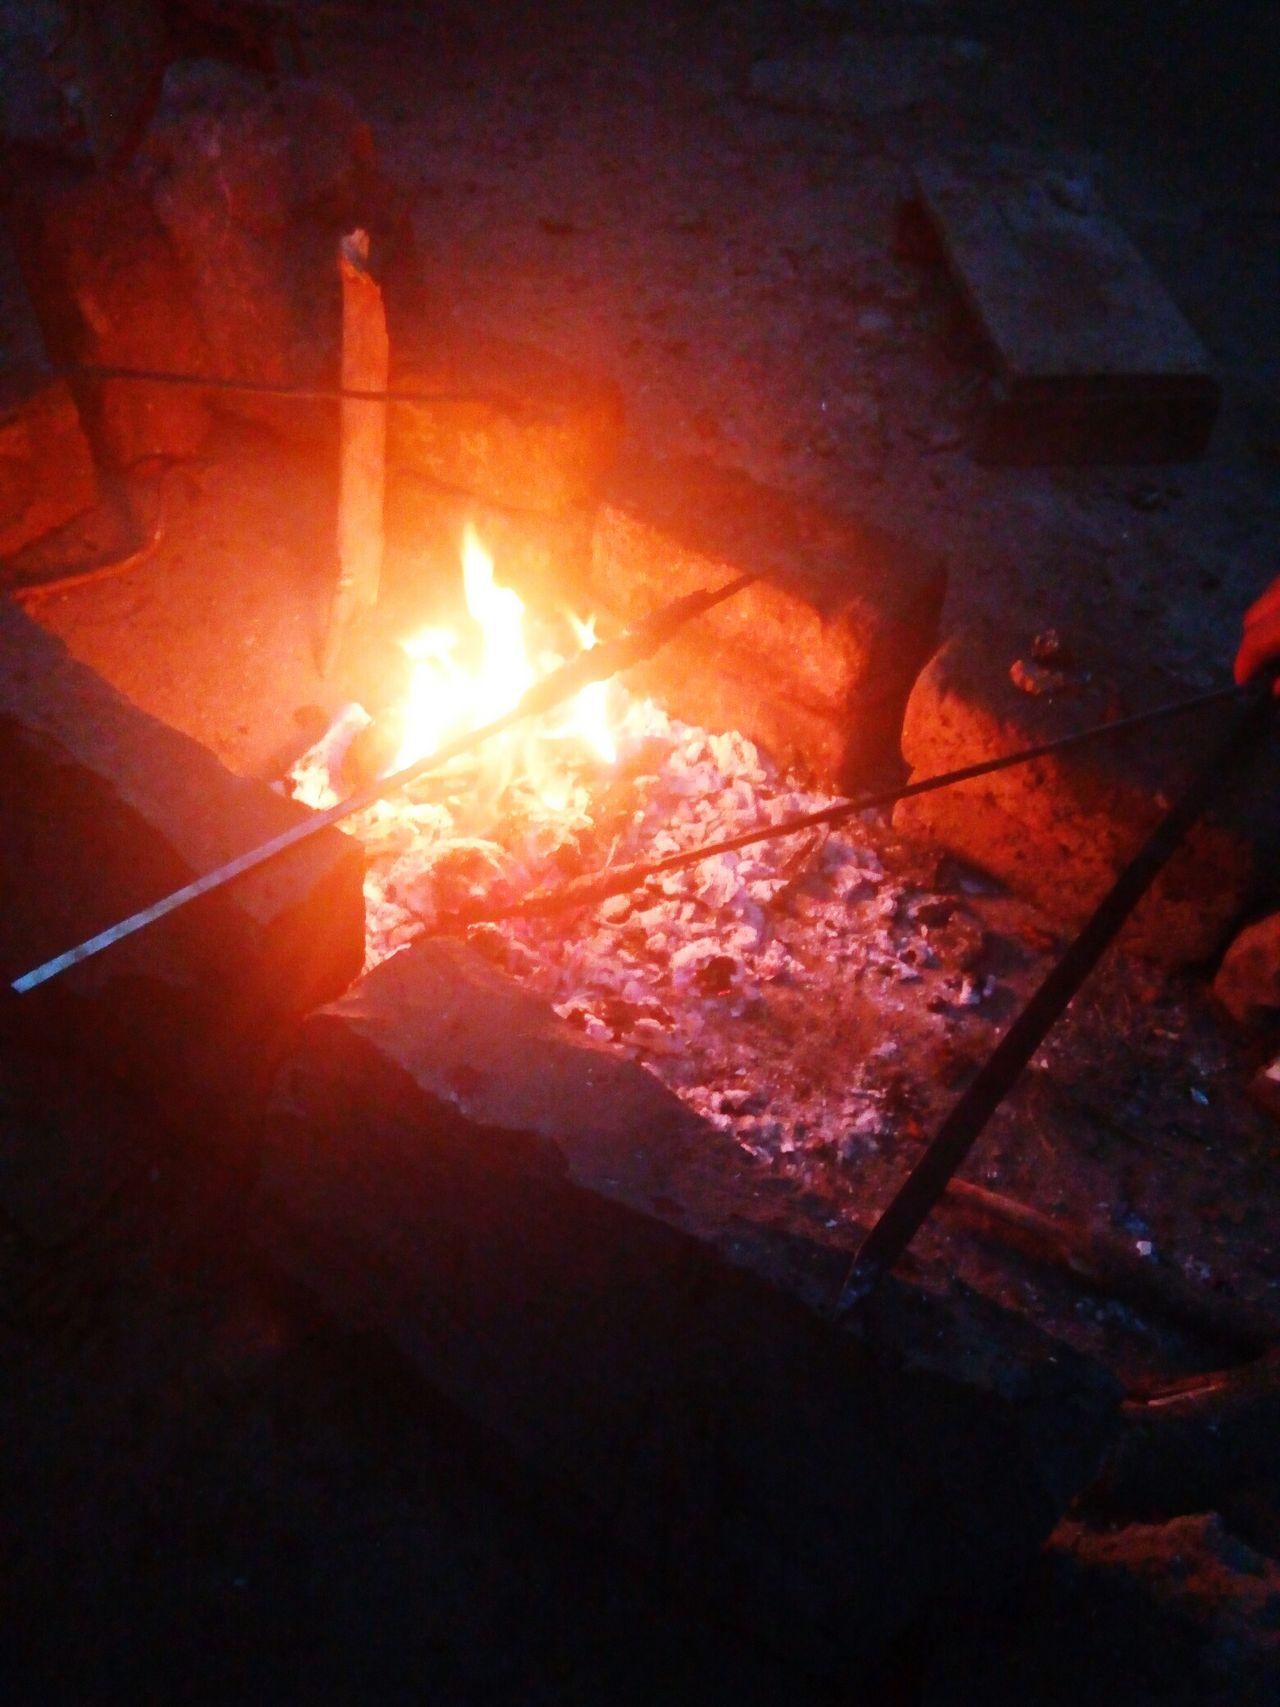 Burning Flame Luminosity Flame Burning Fire - Natural Phenomenon Heat - Temperature Glowing Night Bonfire Firewood Outdoors Paving Stone Damaged Campfire Fire Pit No People Luminosity